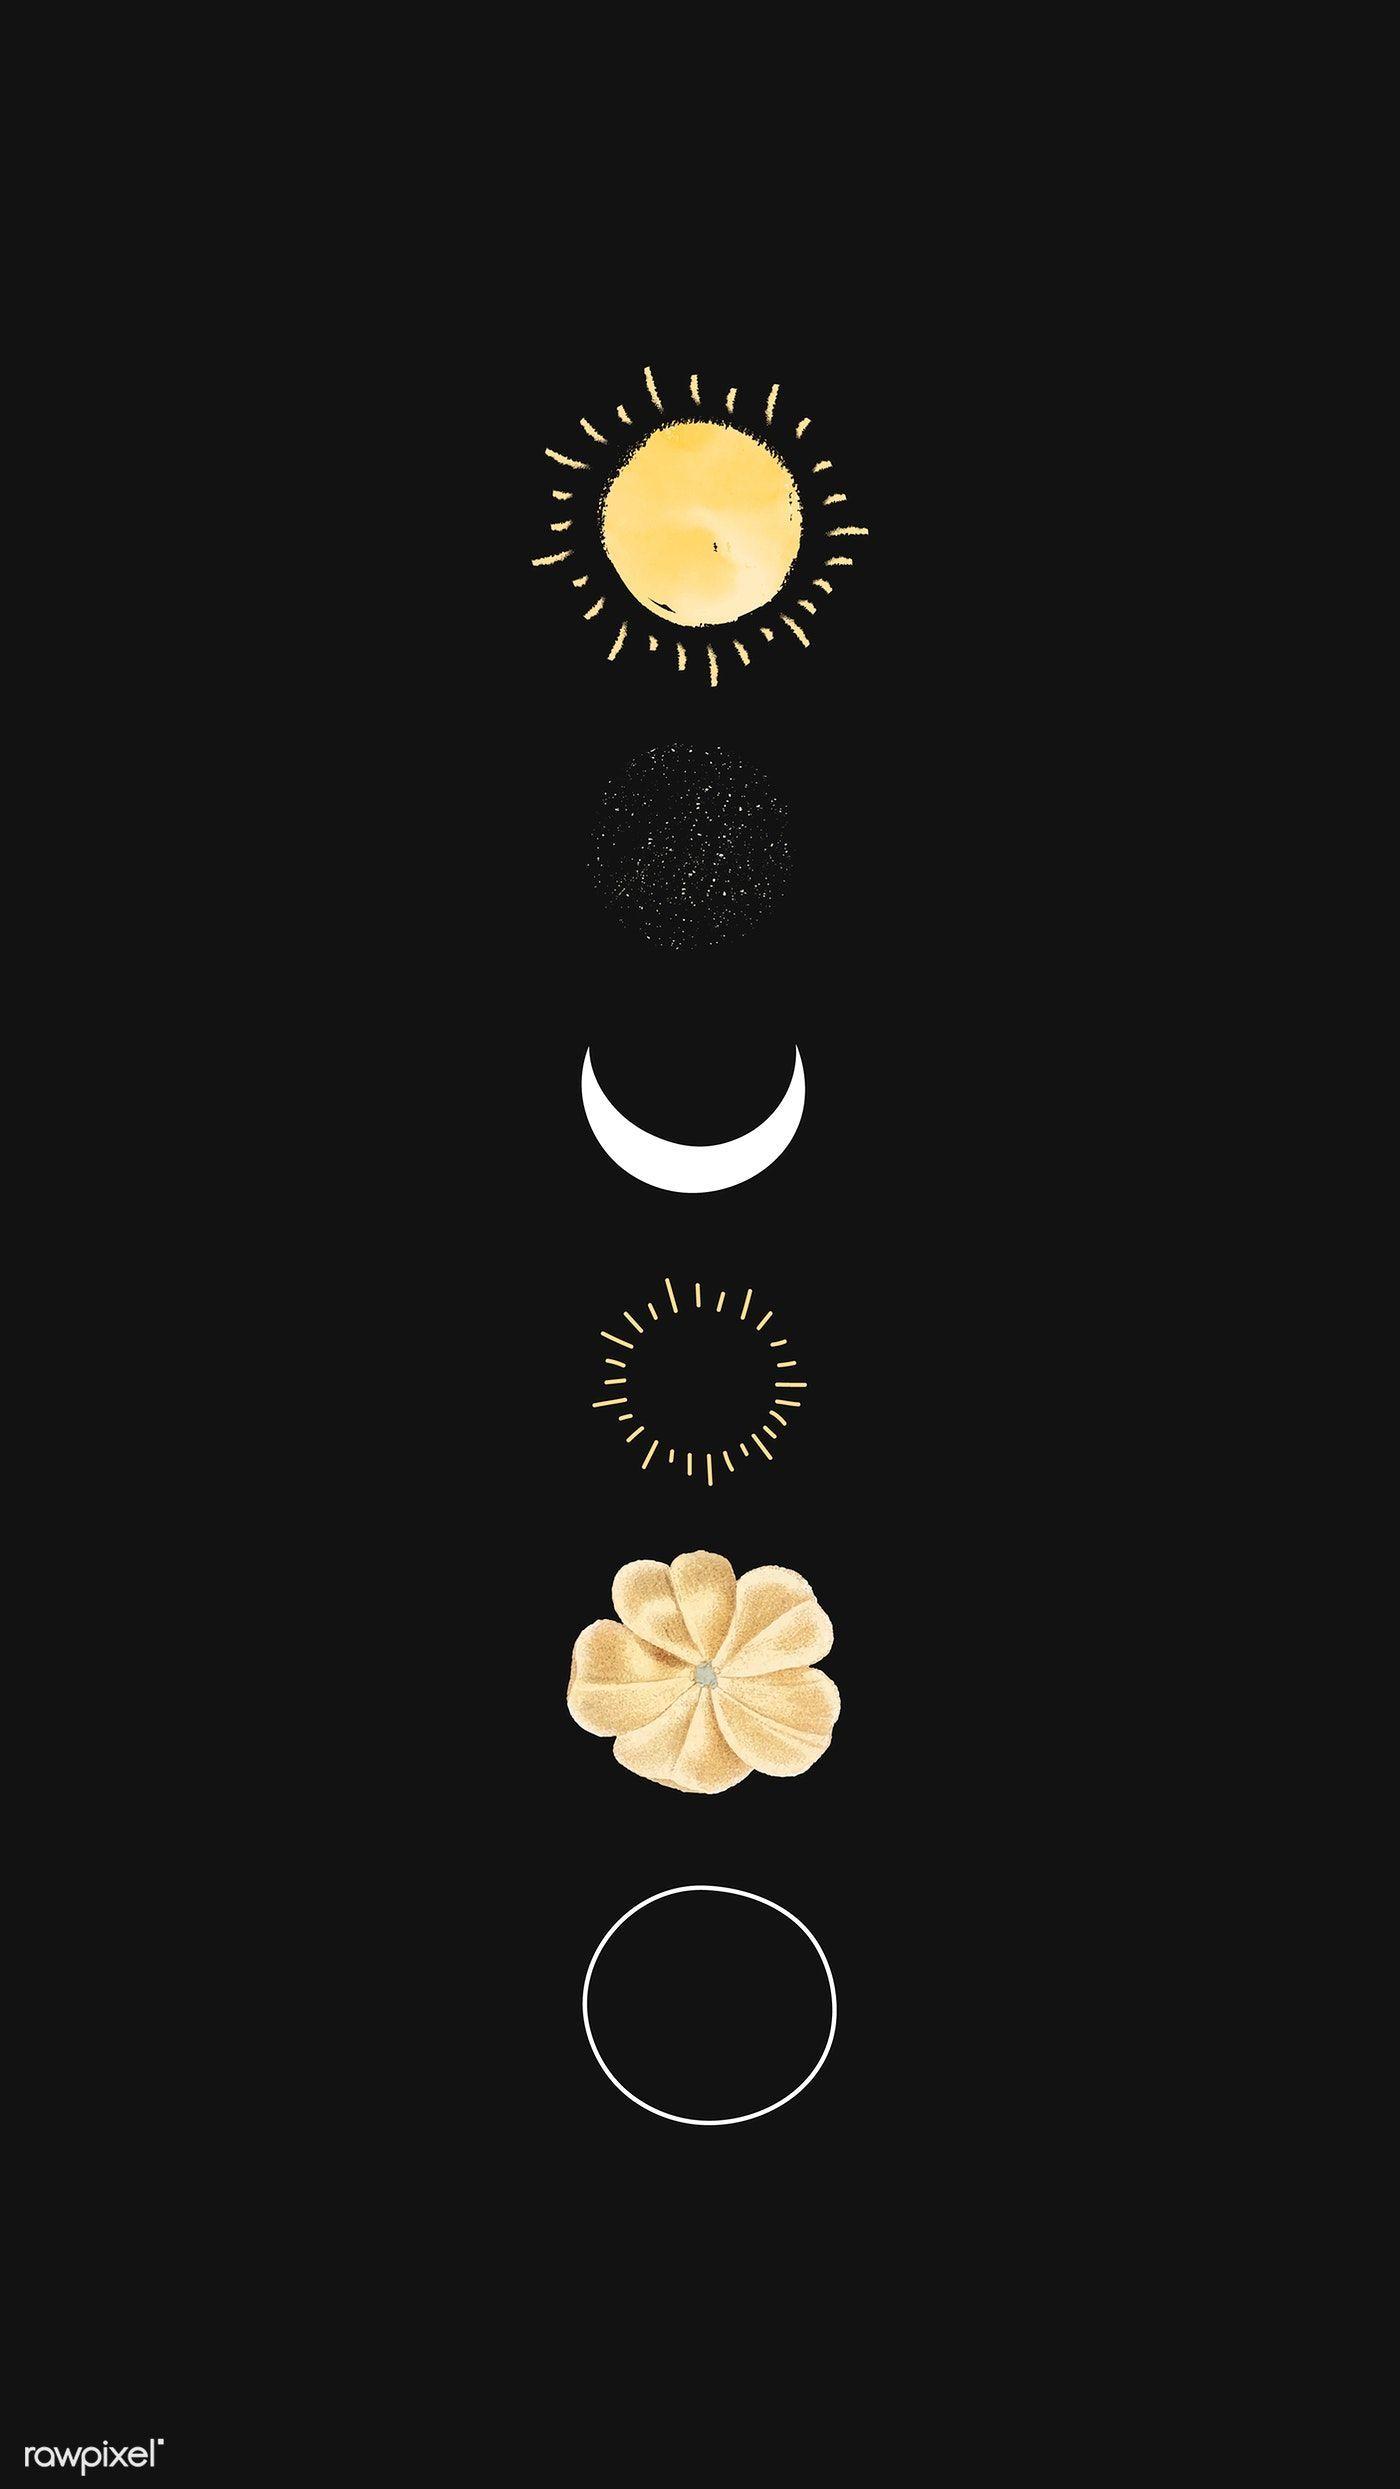 Download premium vector of Floral galaxy design mobile phone wallpaper,  #Design #Download #f...